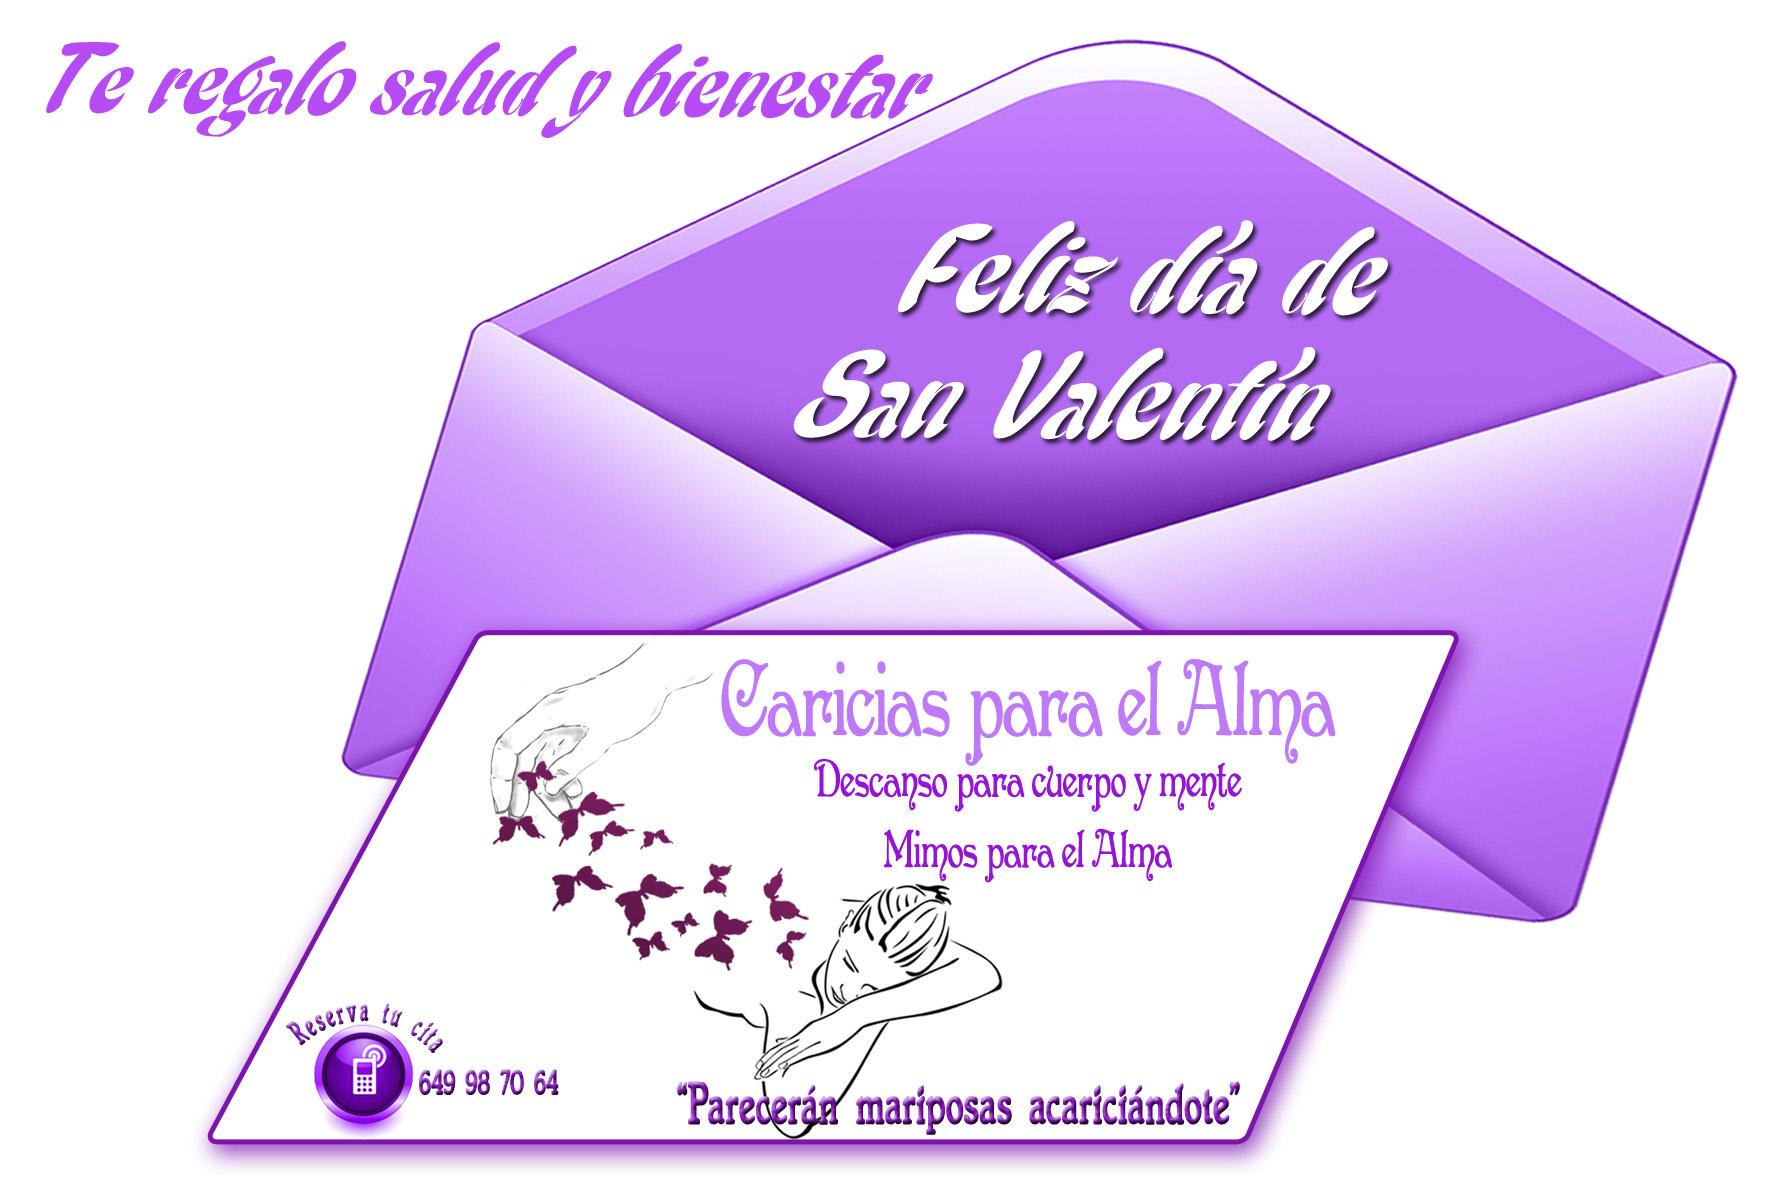 Tarjeta Caricias par ael Alma